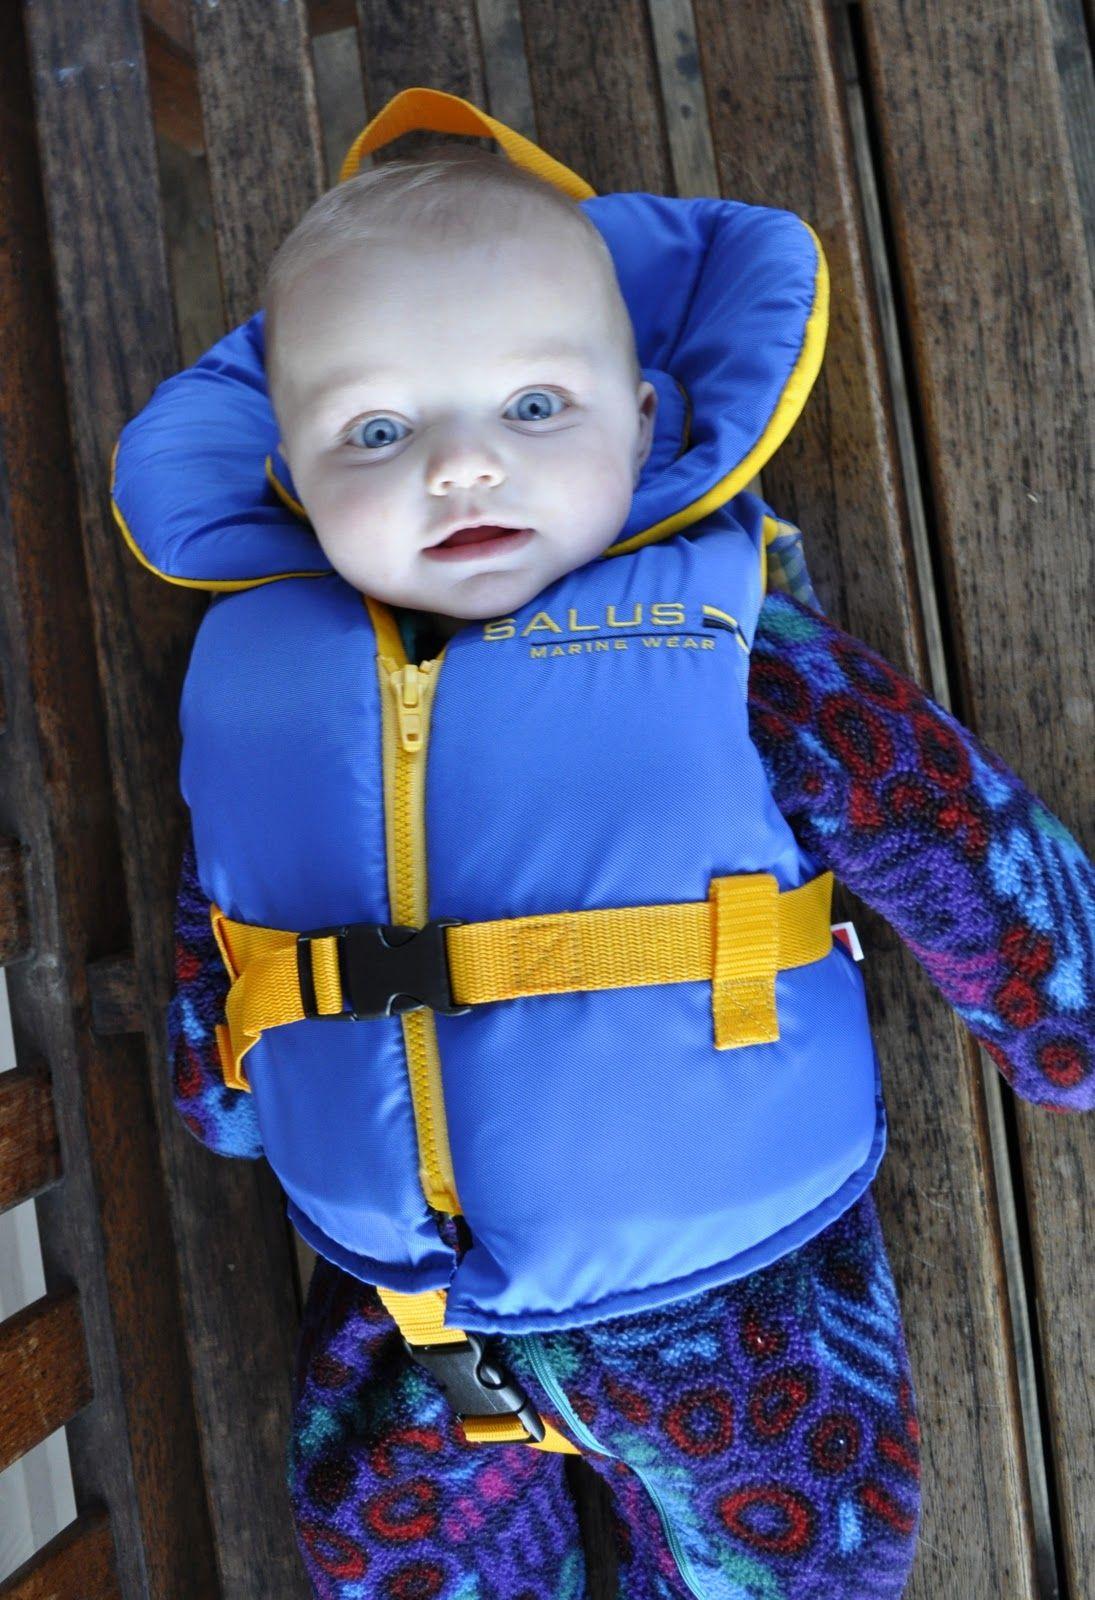 Salus Infant Life Jacket Baby Gear Infant, Child life